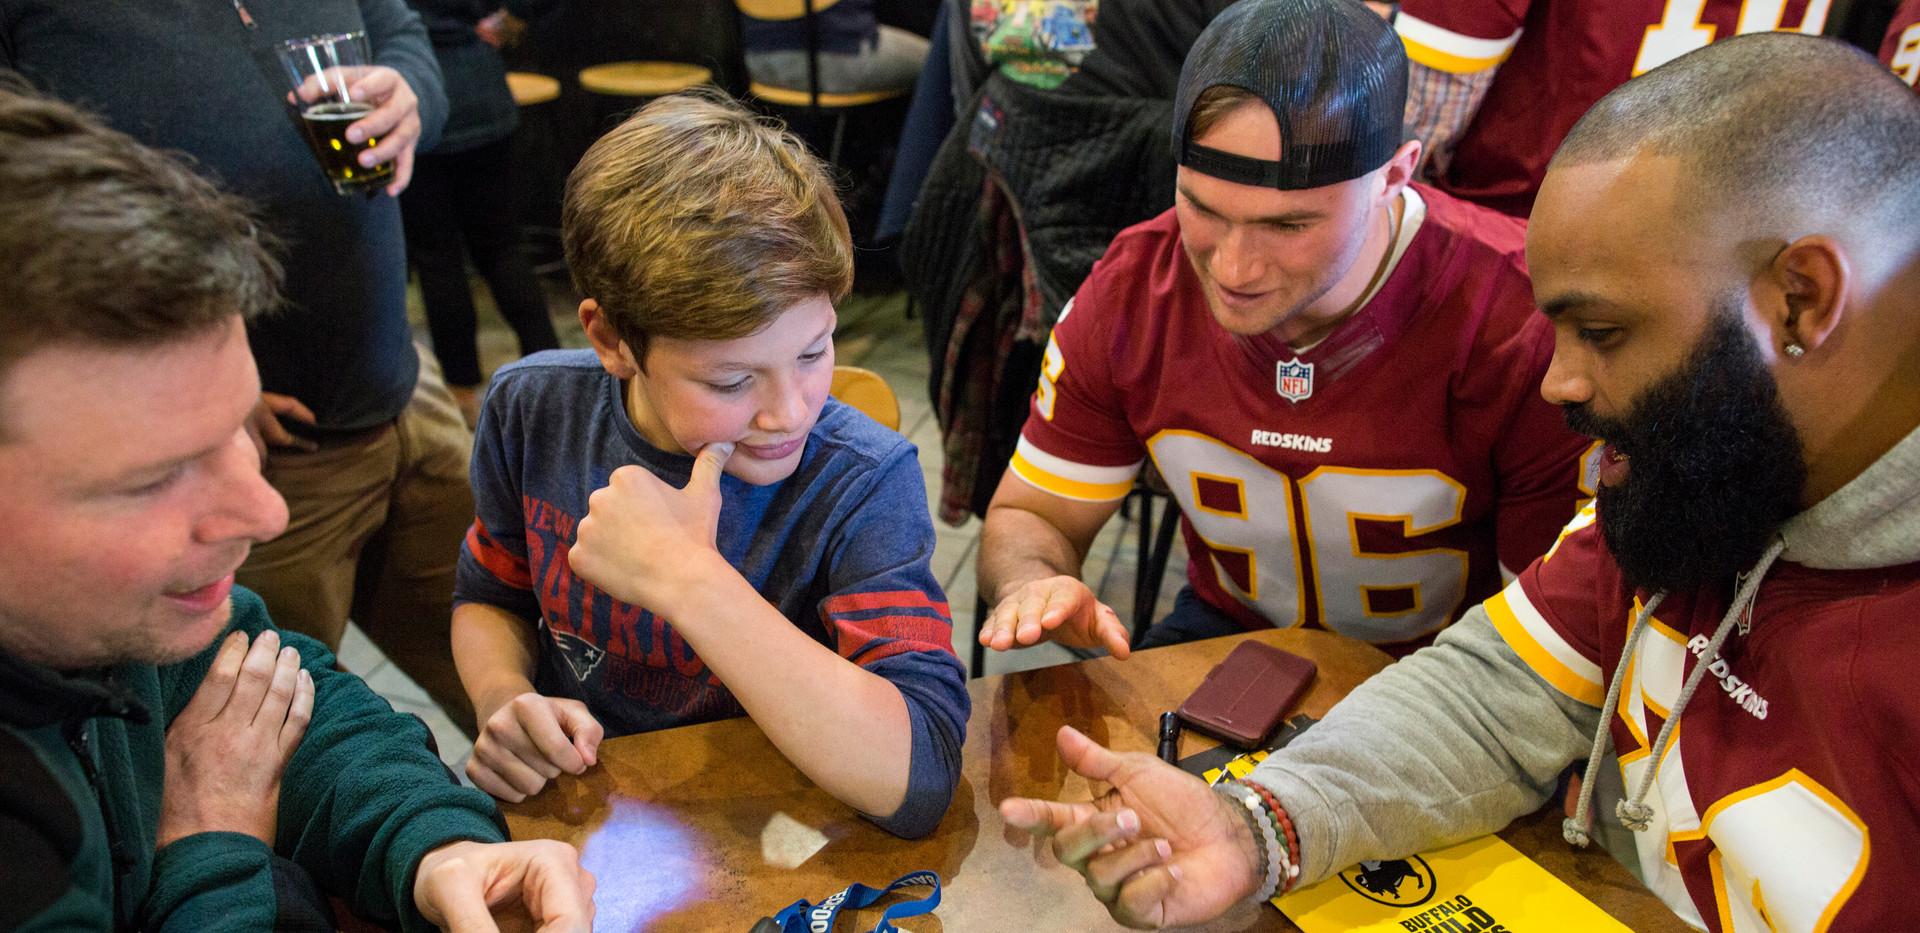 Buzztime & Redskins Launch Party